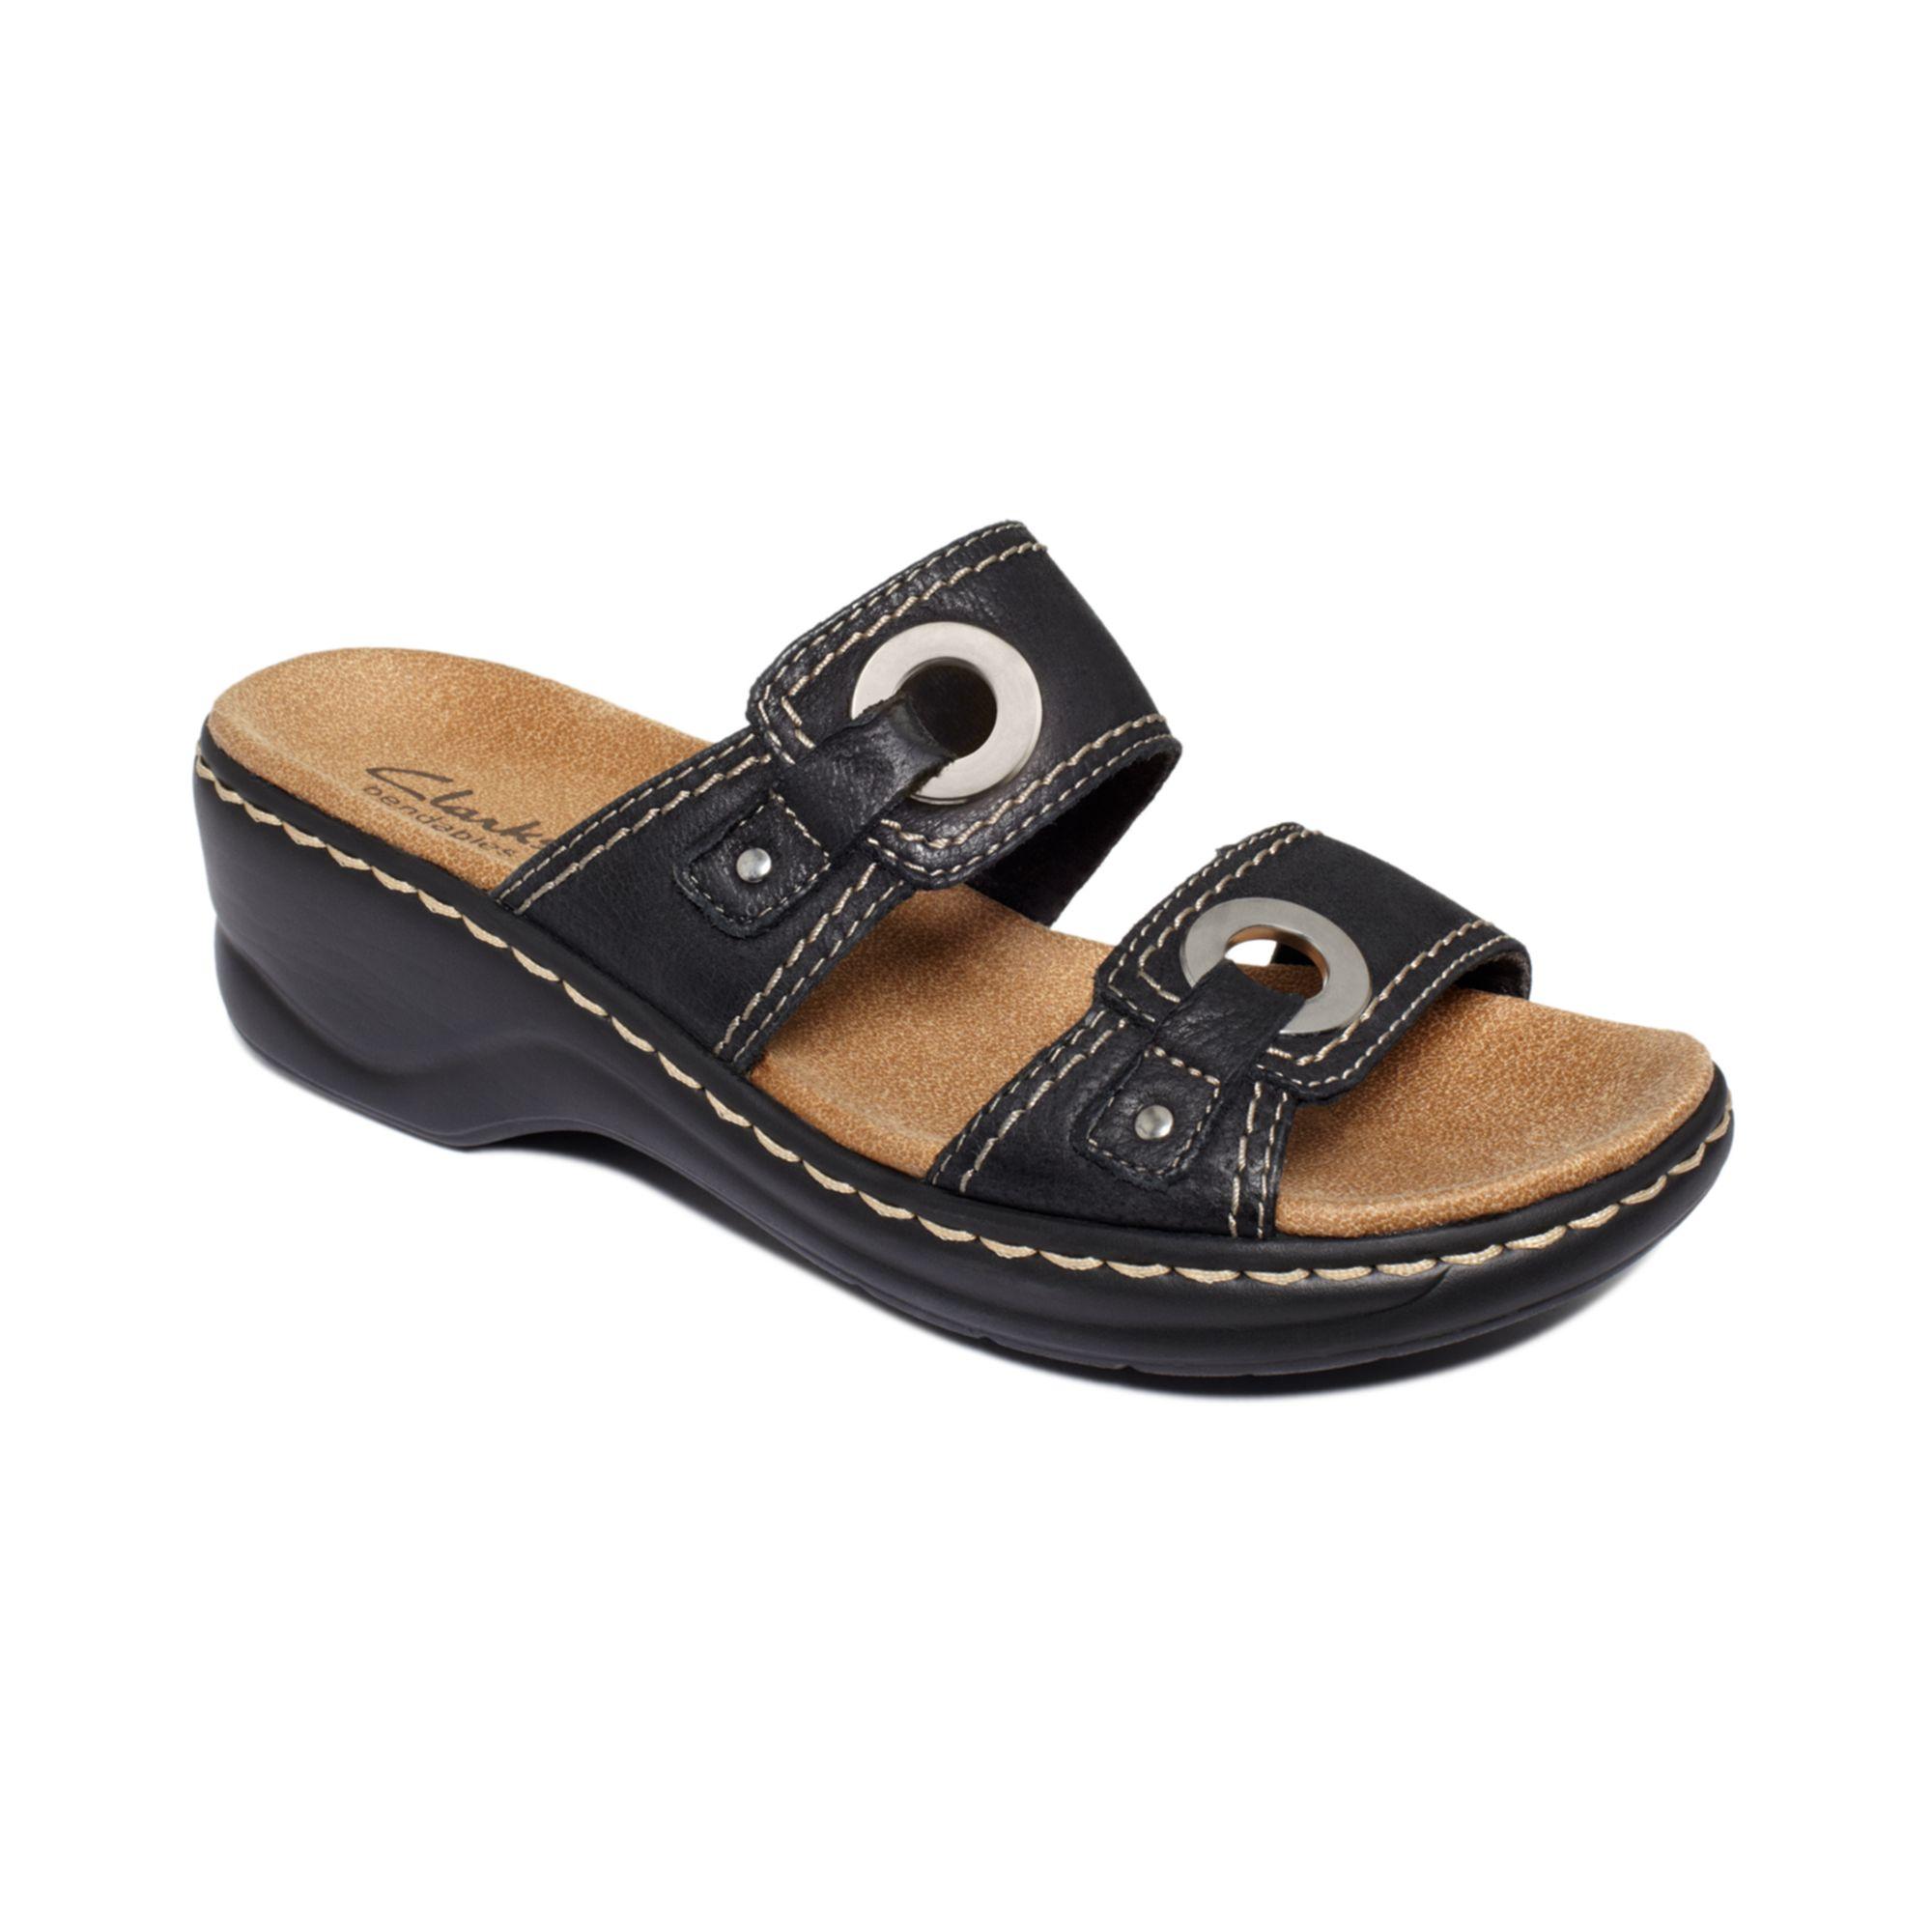 Lyst Clarks Lexi Willow Slide Sandals In Black